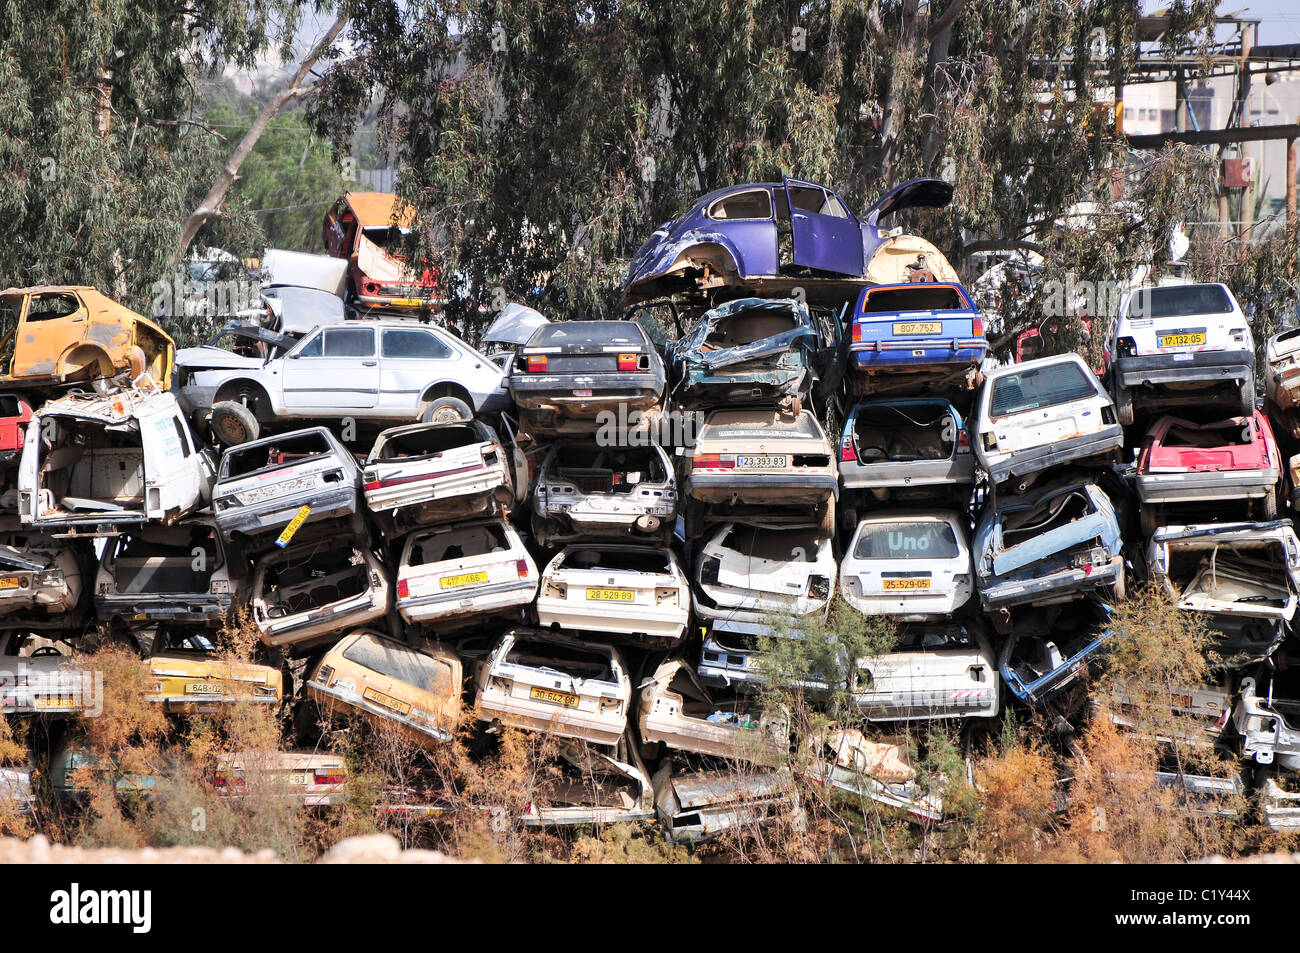 Exelent Salvage Yard Cars Adornment - Classic Cars Ideas - boiq.info